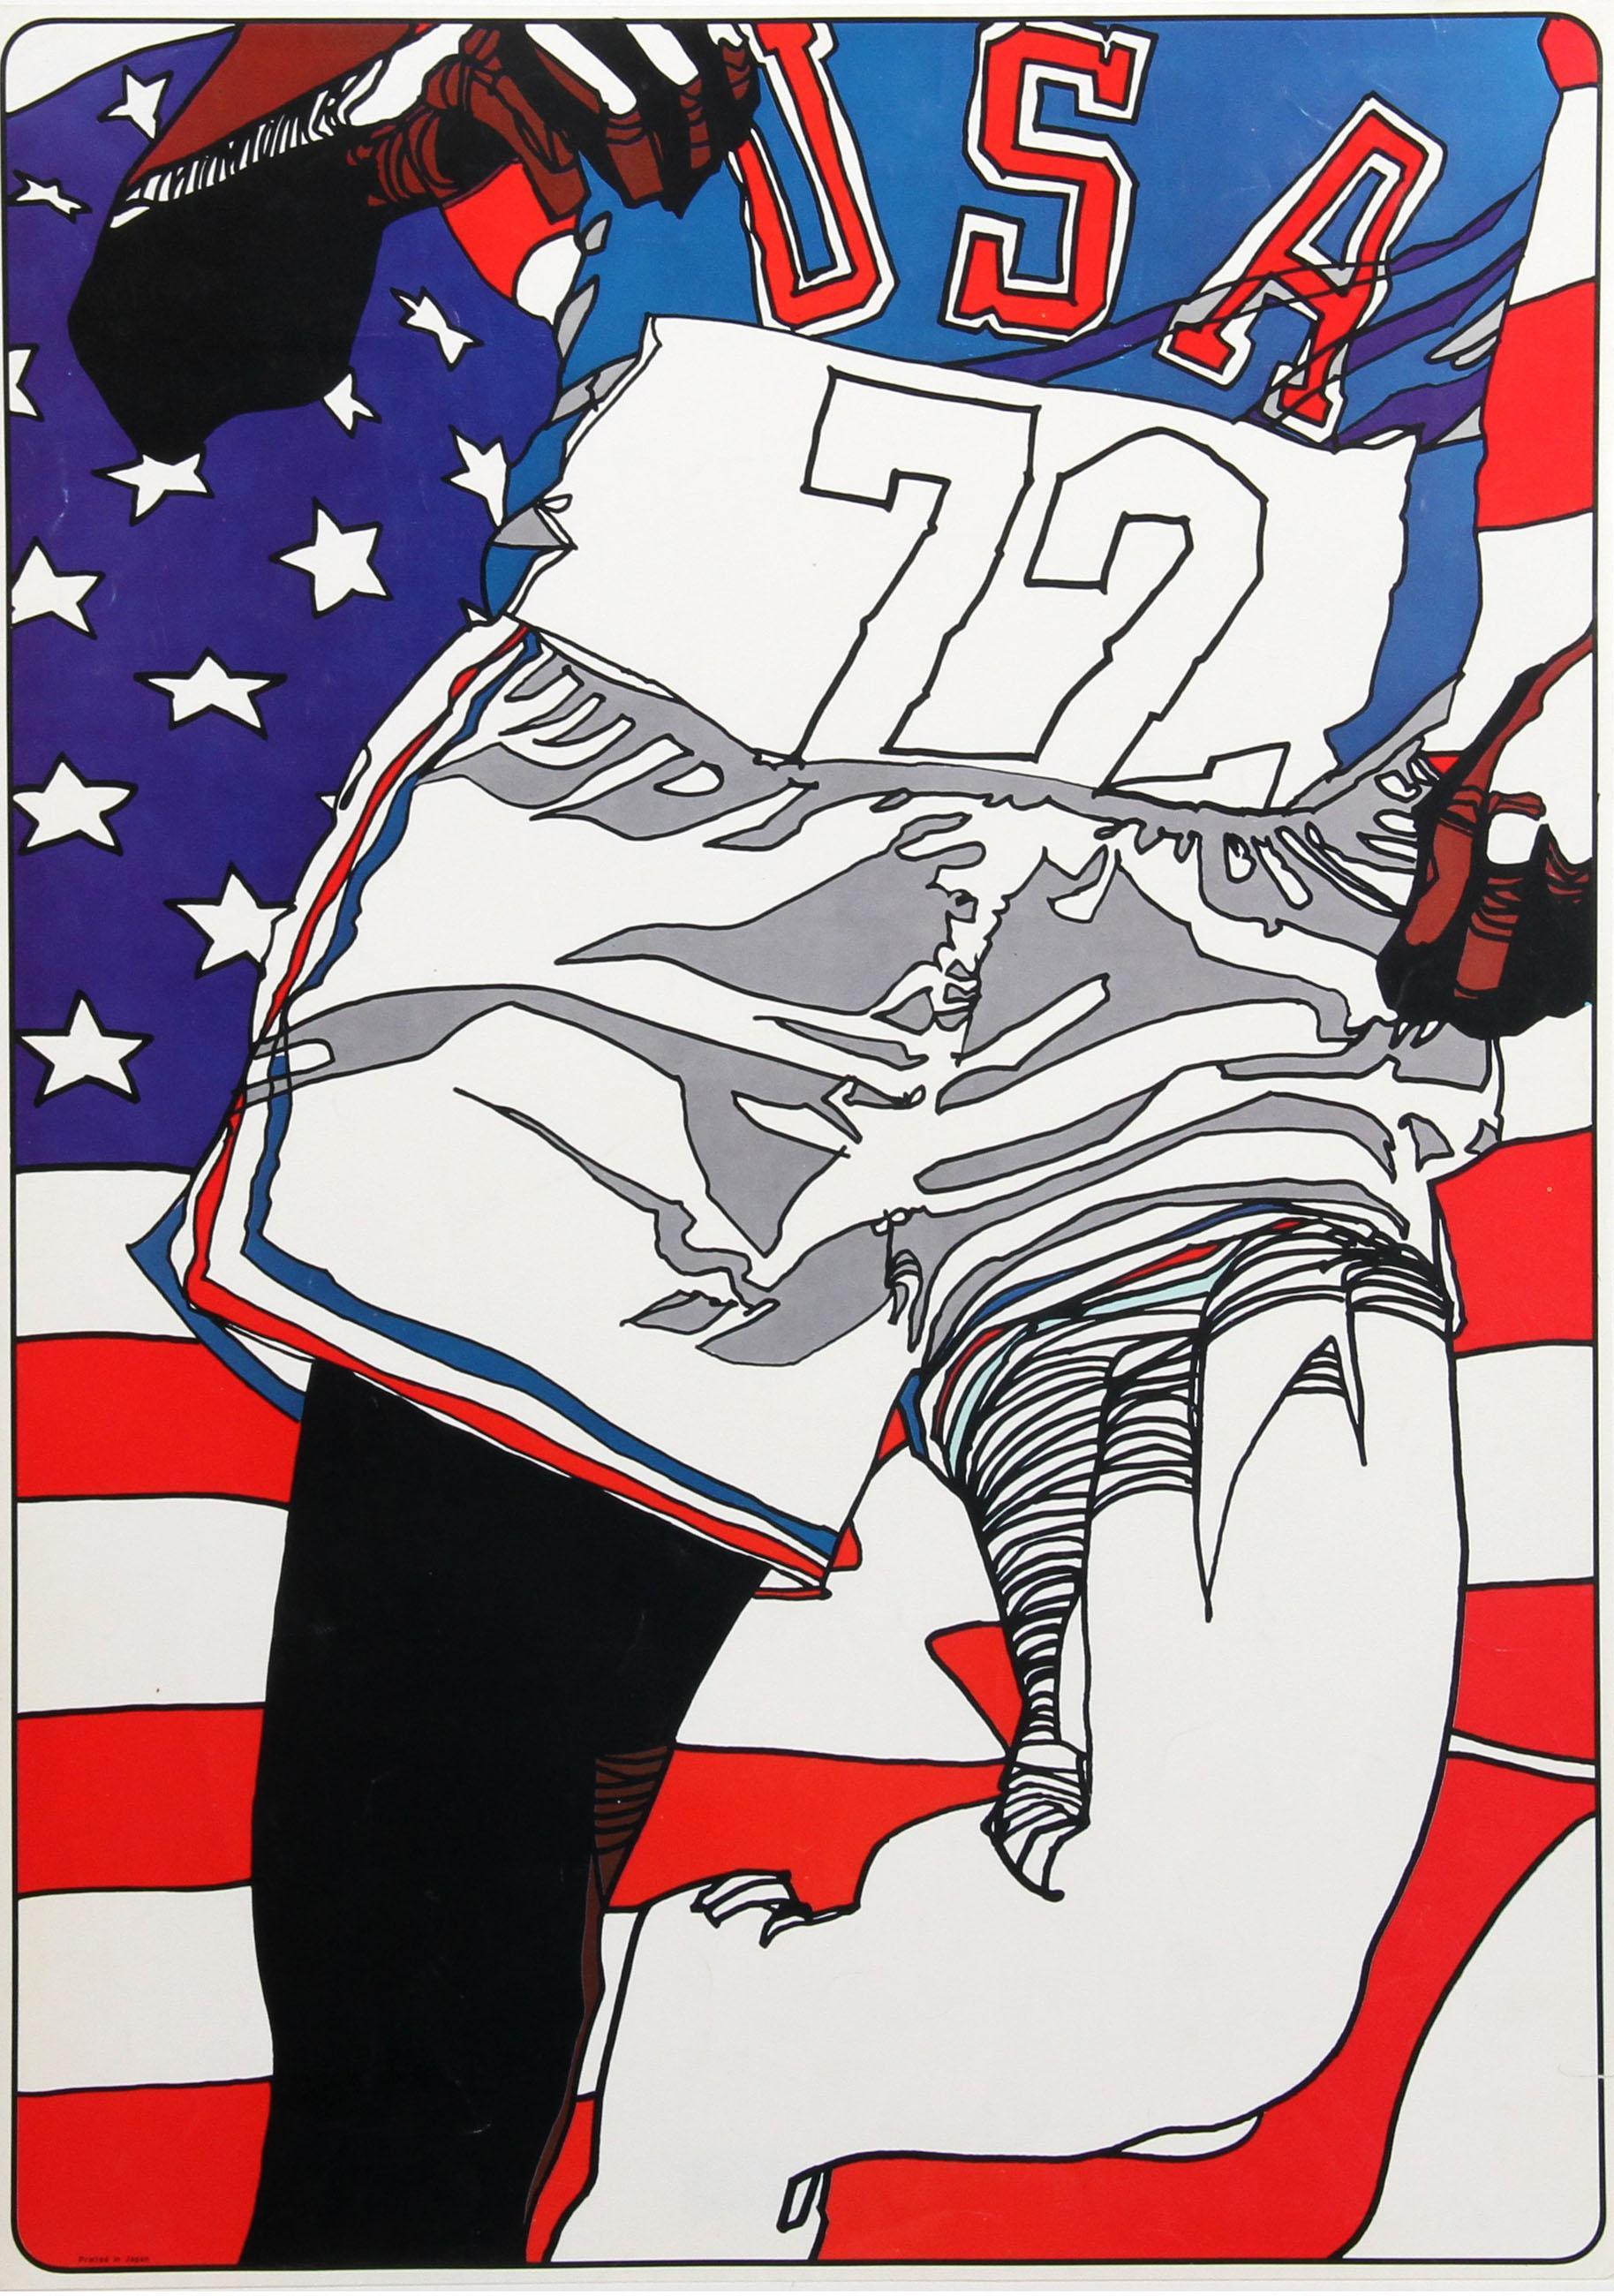 USA Runner '72, Marathon Olympics Poster